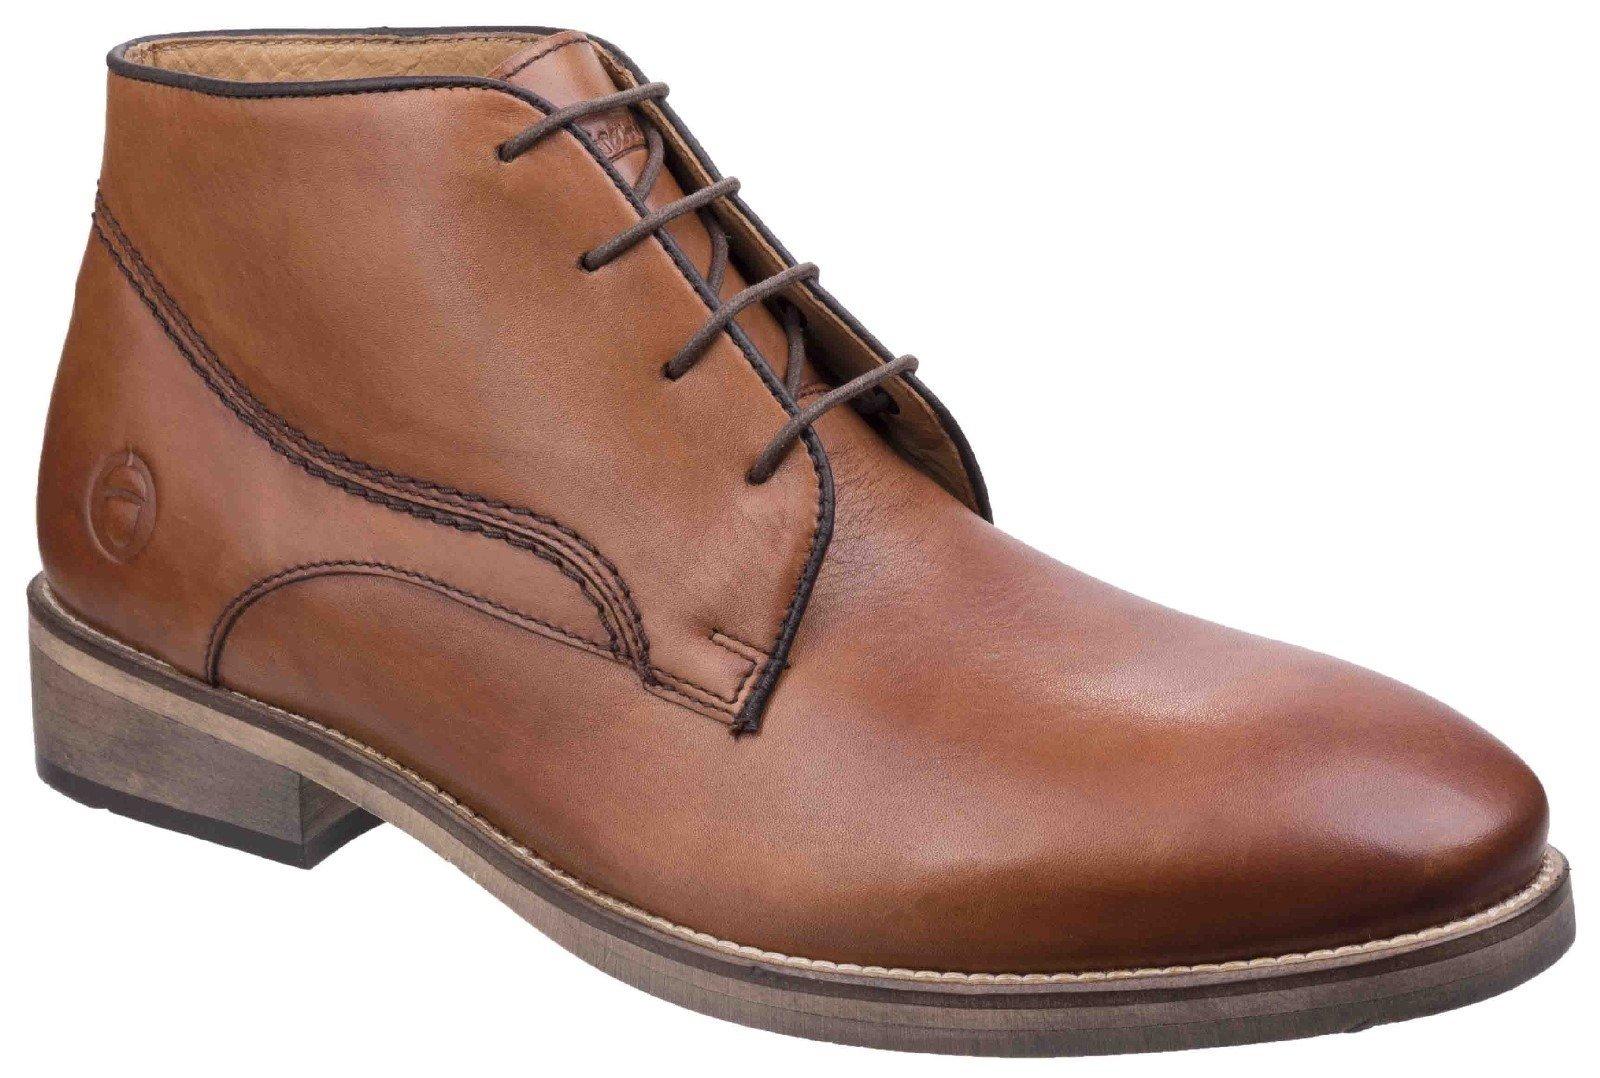 Cotswold Men's Maugesbury Ankle Boot Various Colours 26269 - Tan 6